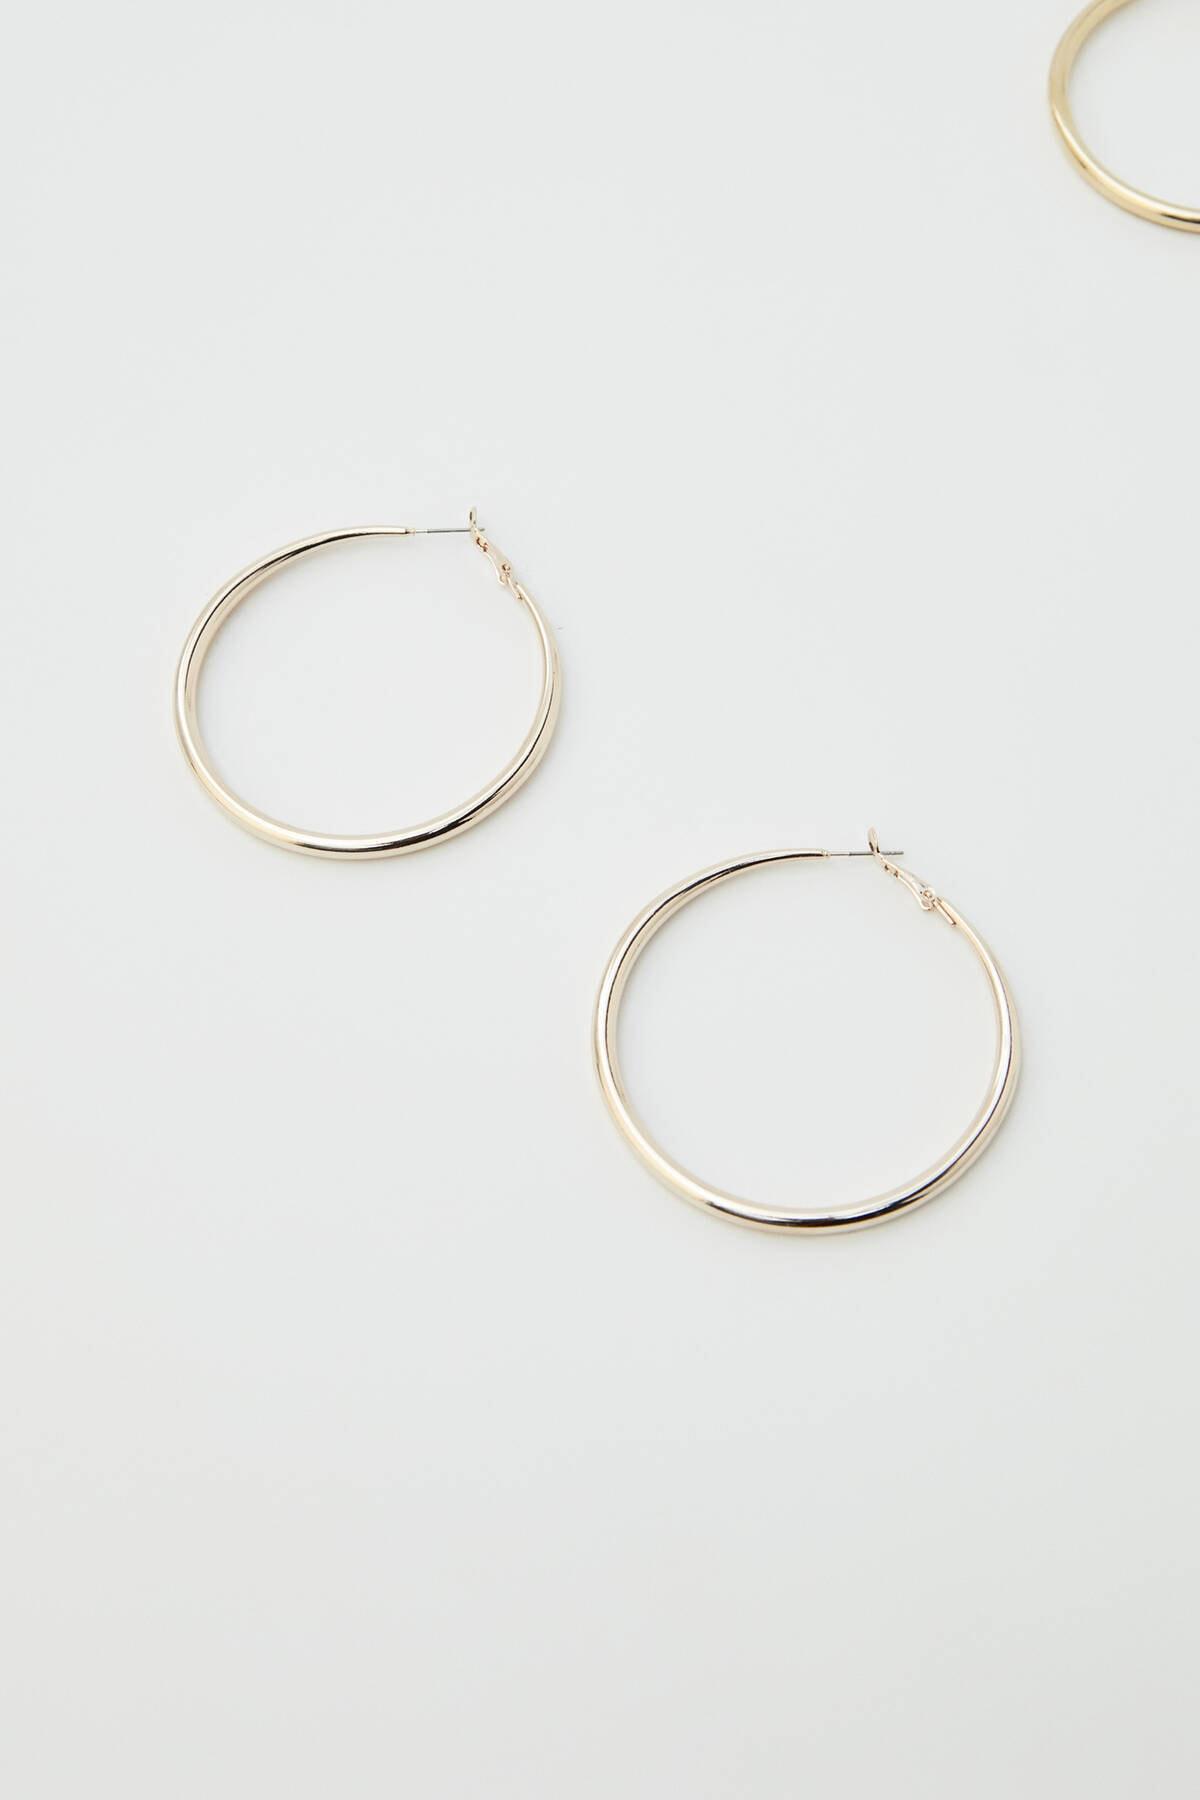 Pull & Bear Kadın Gümüş Karma Renkli Halka Küpe Seti 09996384 3